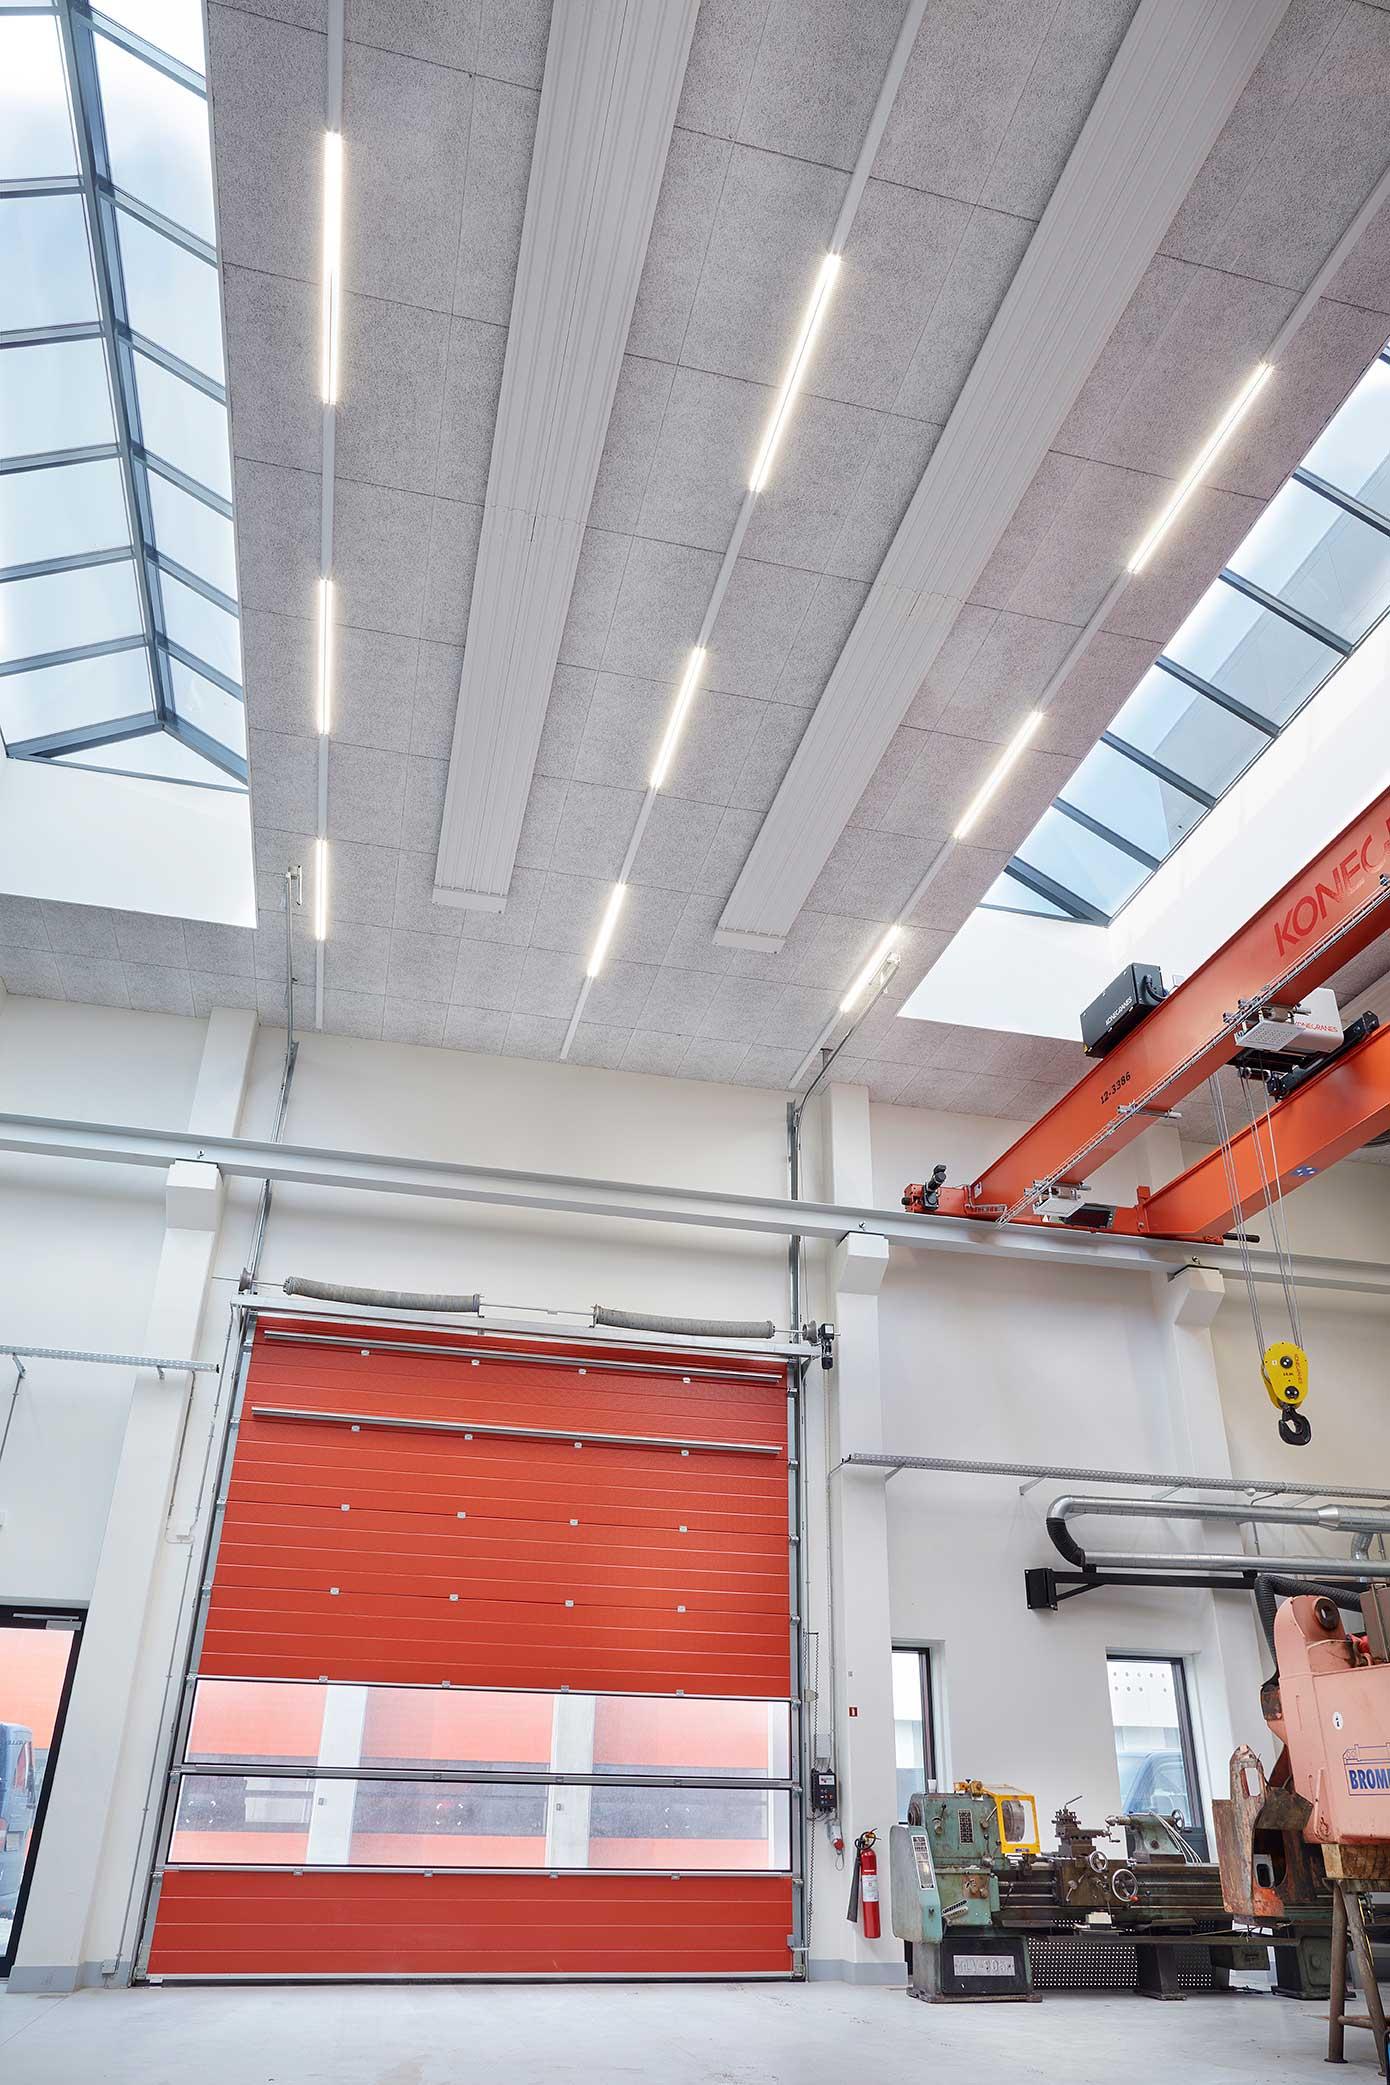 Linia indsats monteret i skinnesystem påbygget på loft RIDI produkt - Luminex